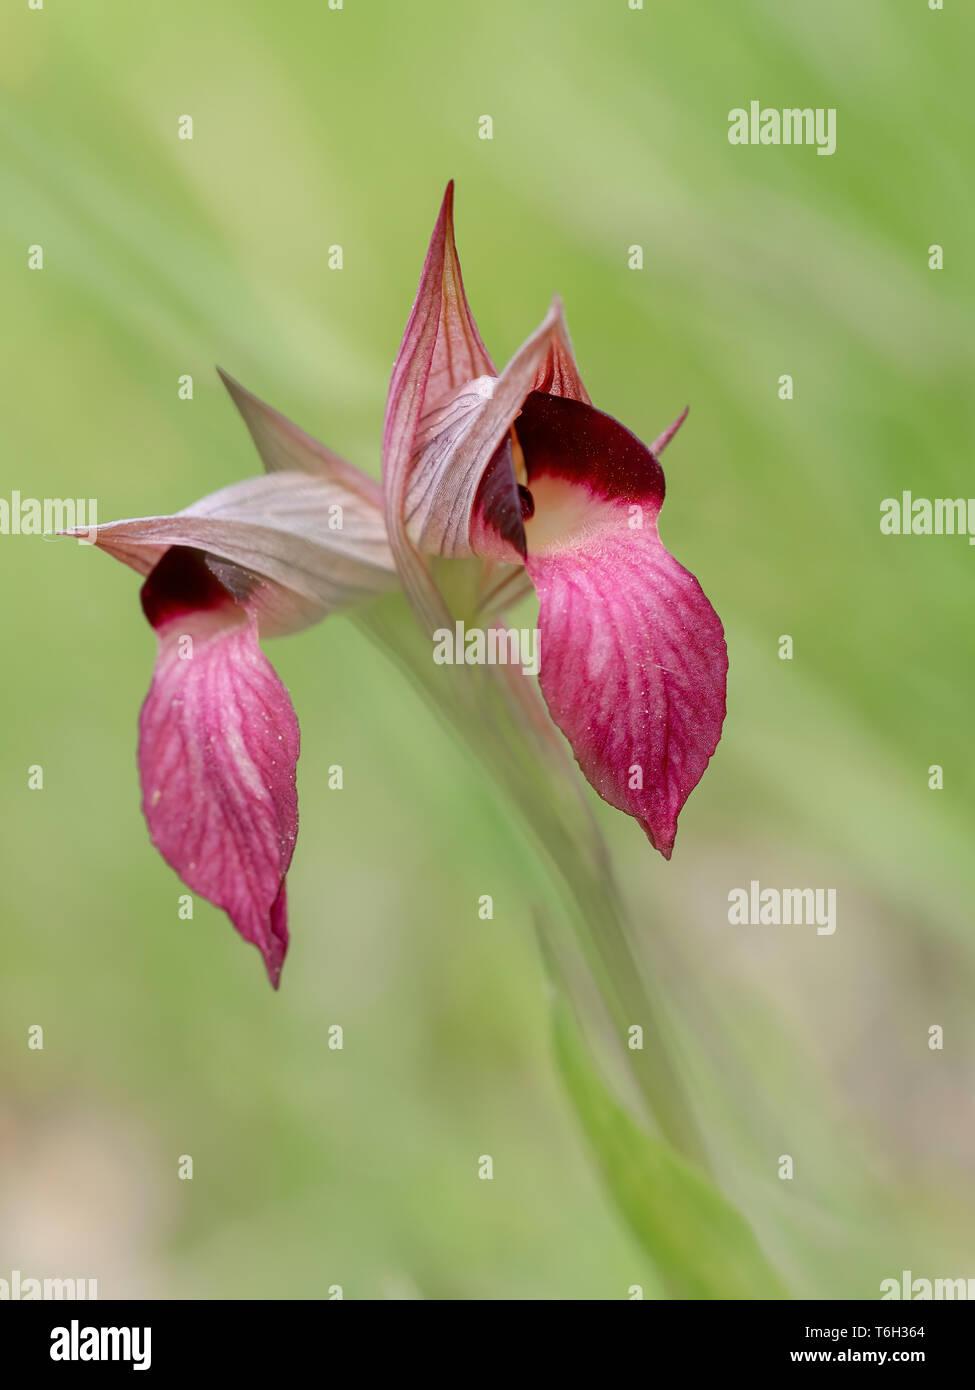 Serapias Lingua, Tongue orchid. Defocussed background. - Stock Image